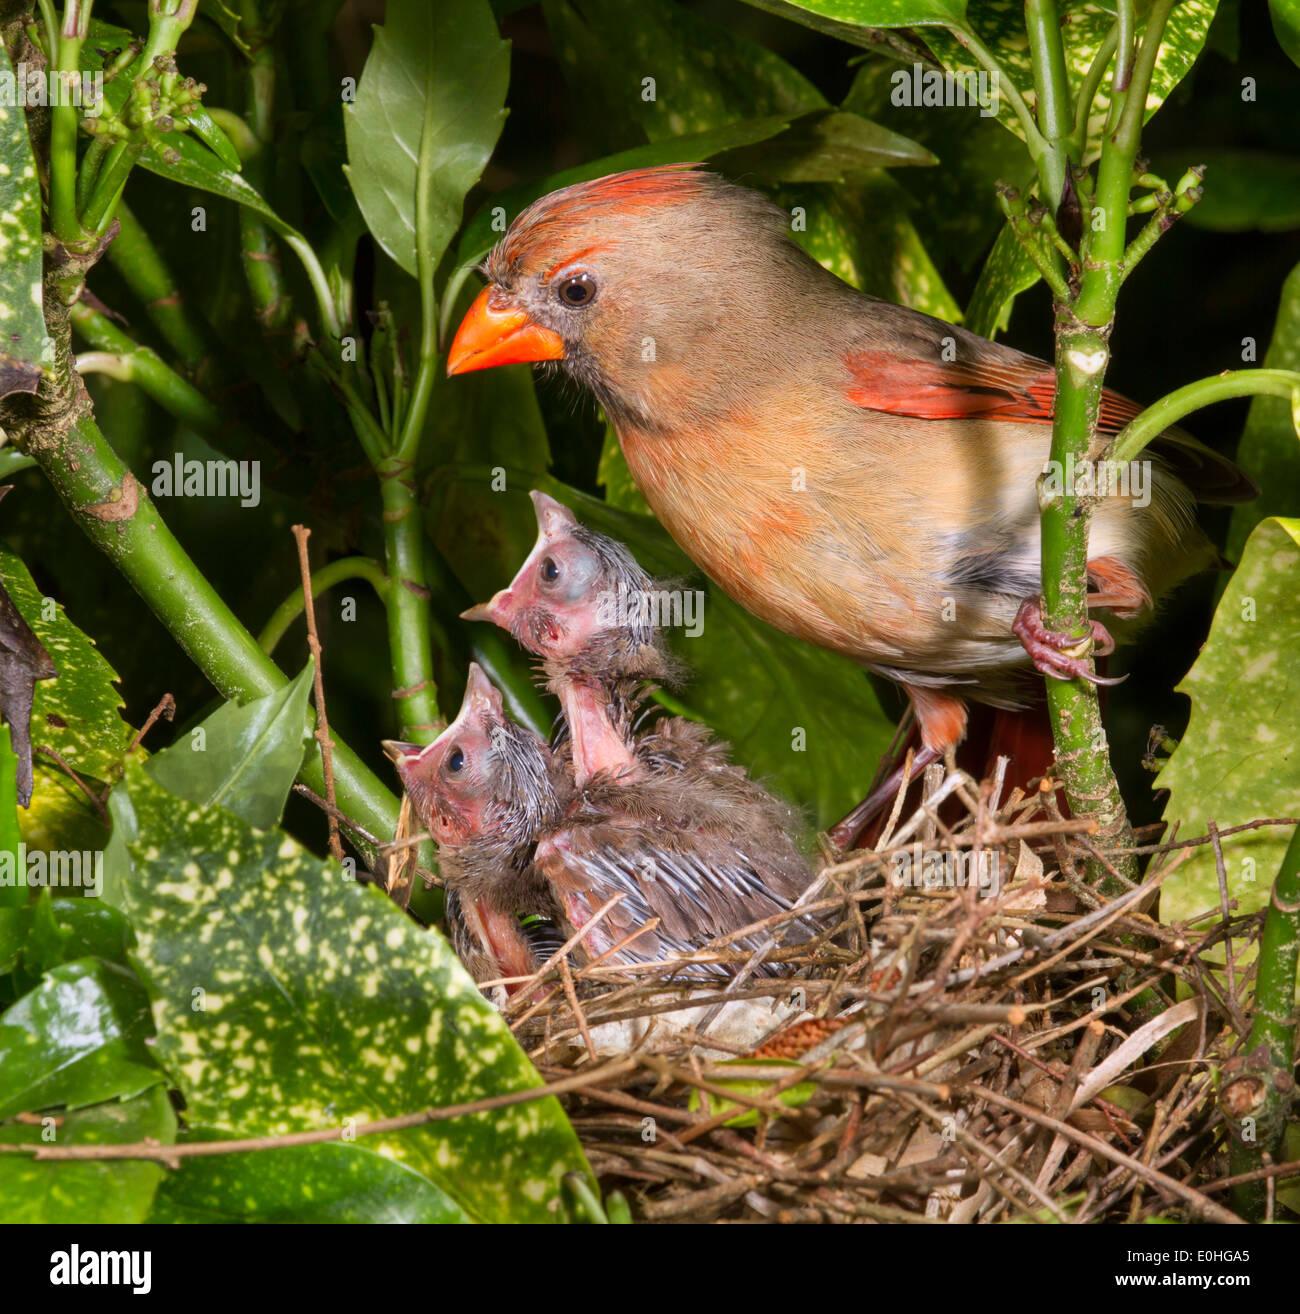 Female northern cardinal (Cardinalis cardinalis) near the nest with nestlings. Stock Photo